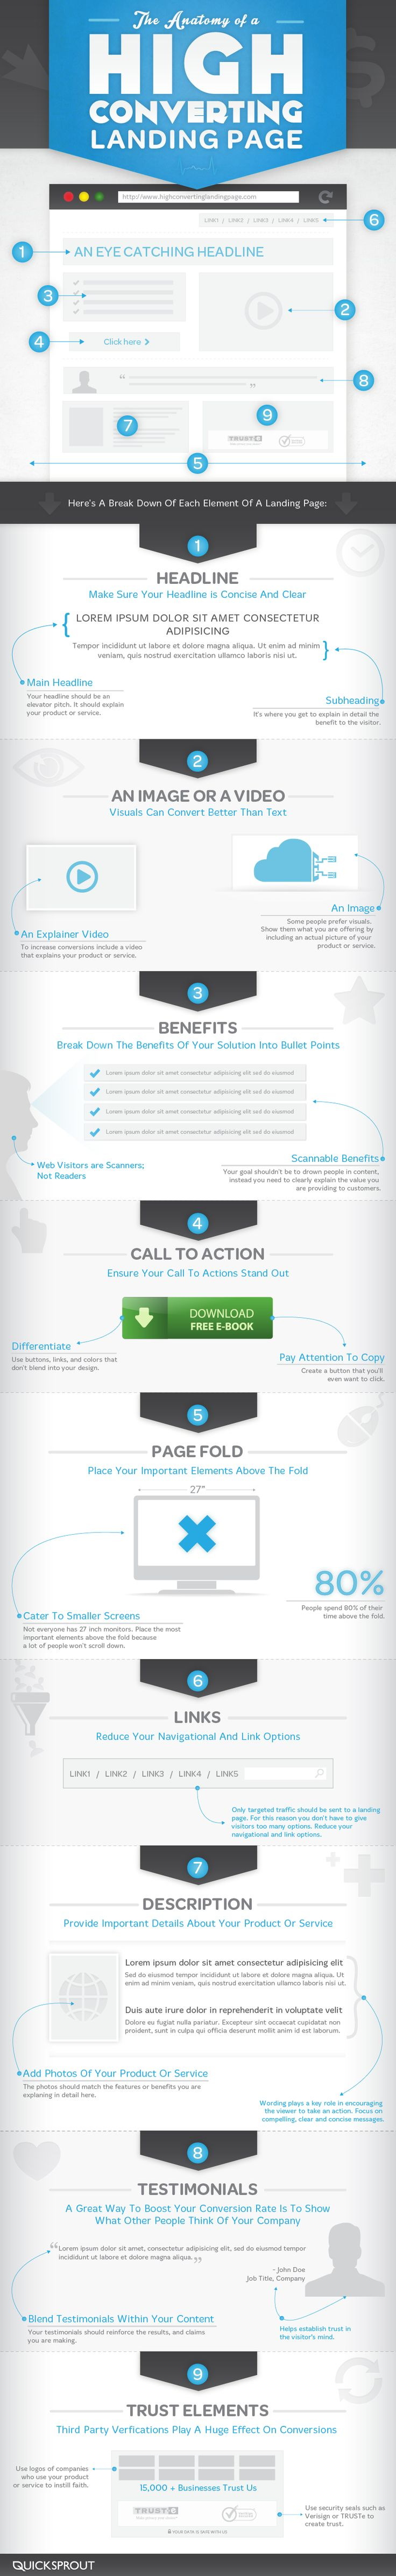 high converting landing pages #digitalmarketing #growthhacking #ingographic